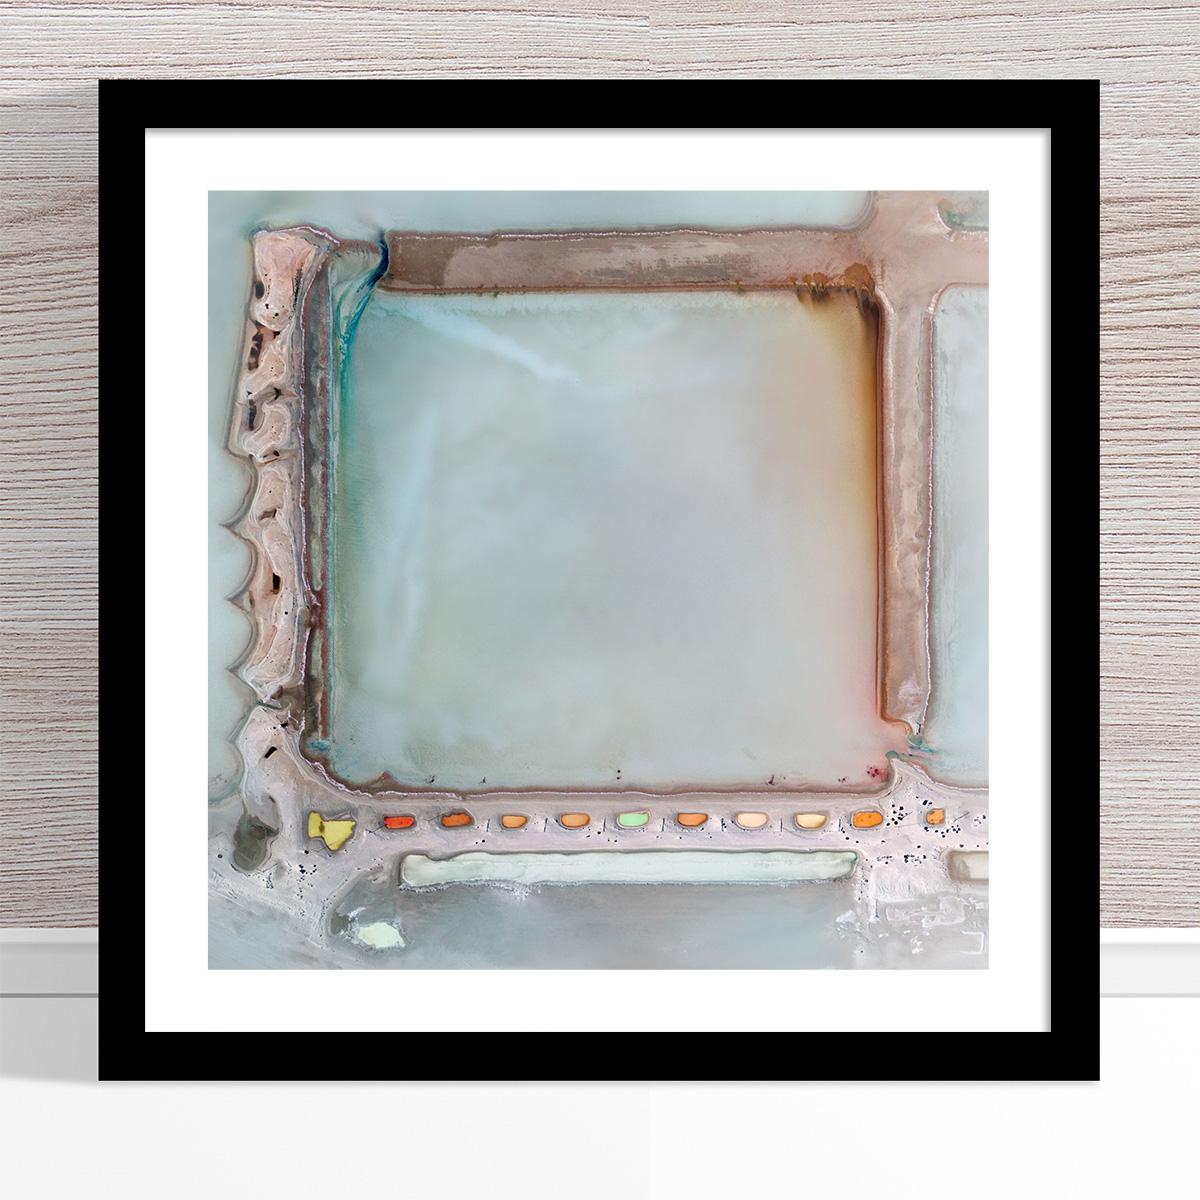 Chris Saunders - 'Aerial Salt 022' Black Frame